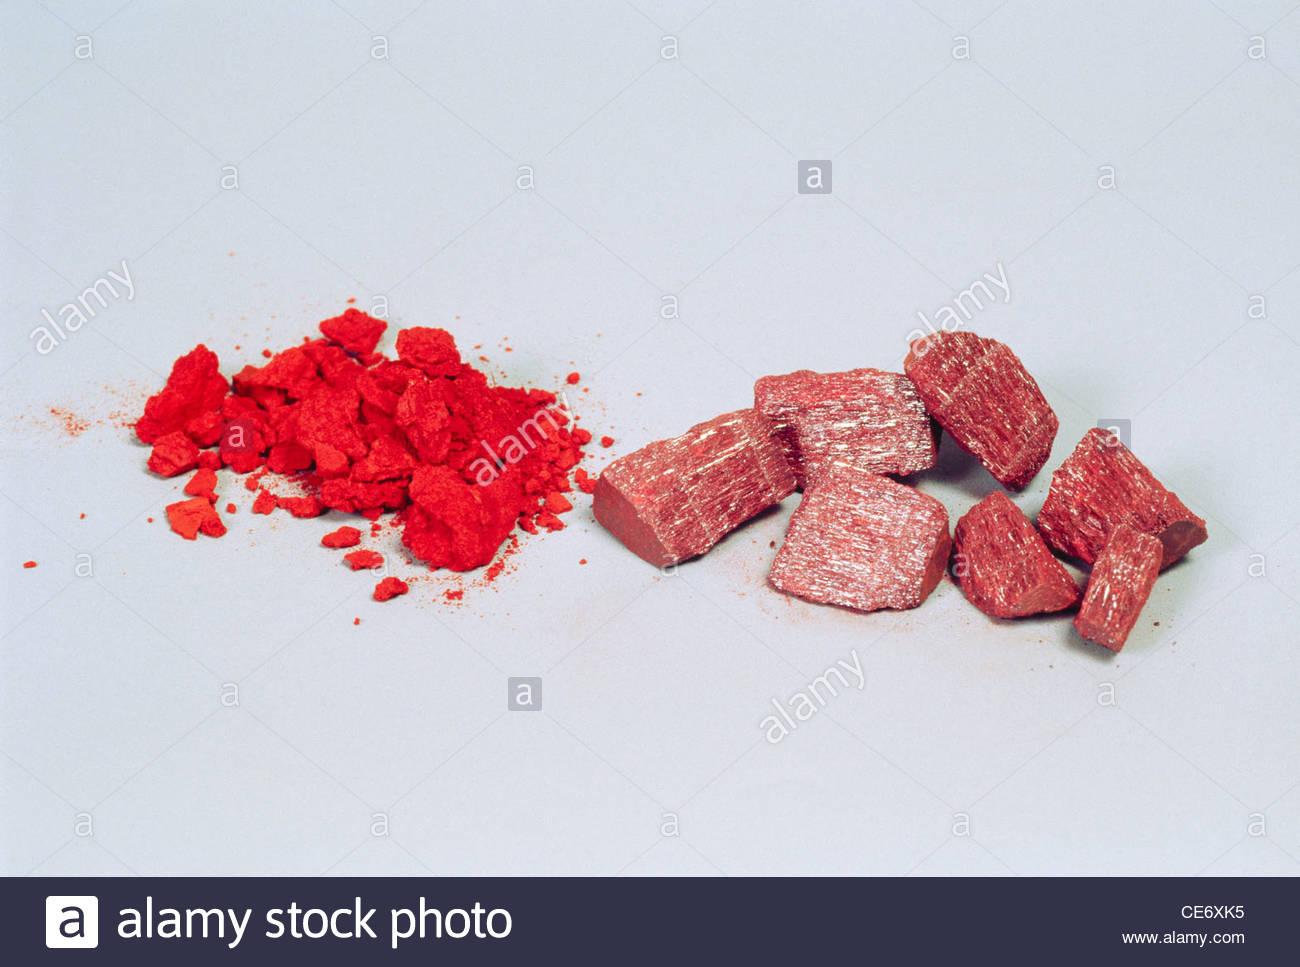 pure and impure hingul cinnabar - Stock Image